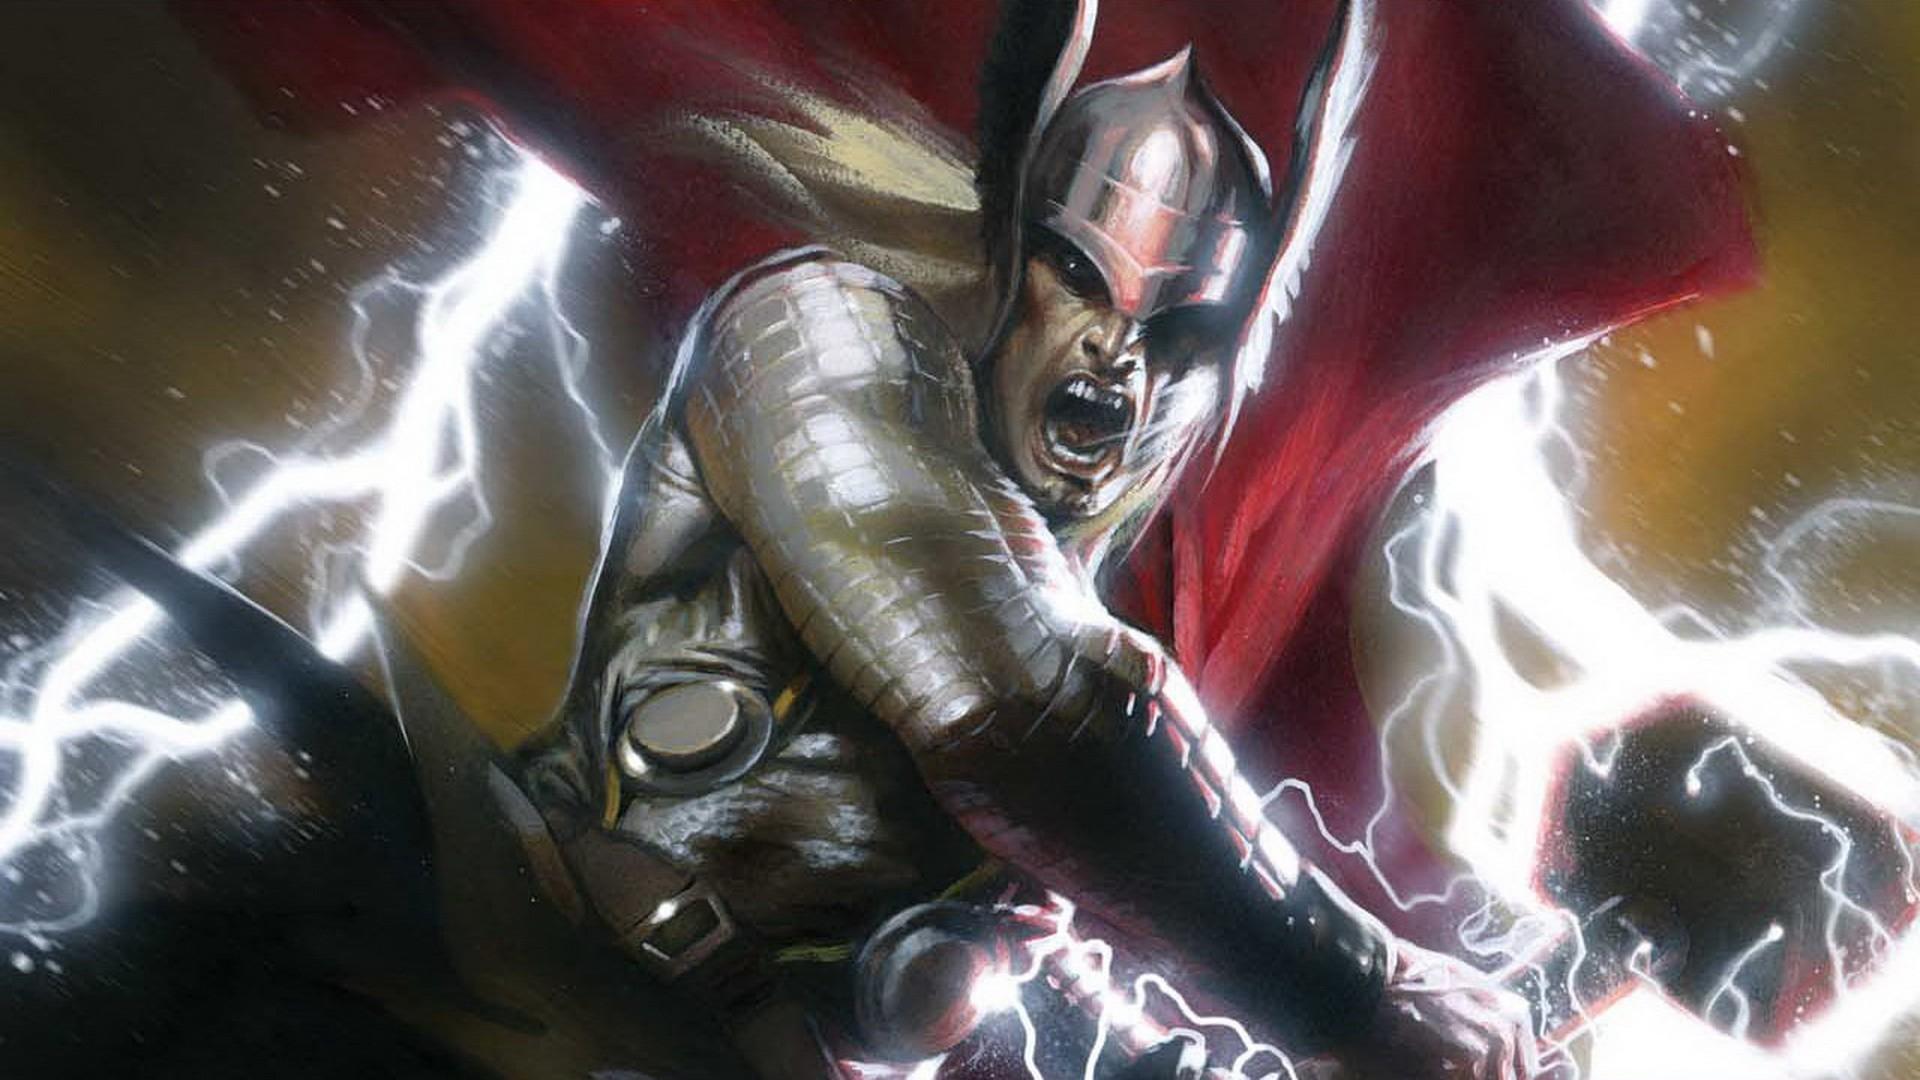 Res: 1920x1080, Comics-Thor-Marvel-Comics-Avengers-Fresh-New-Hd-